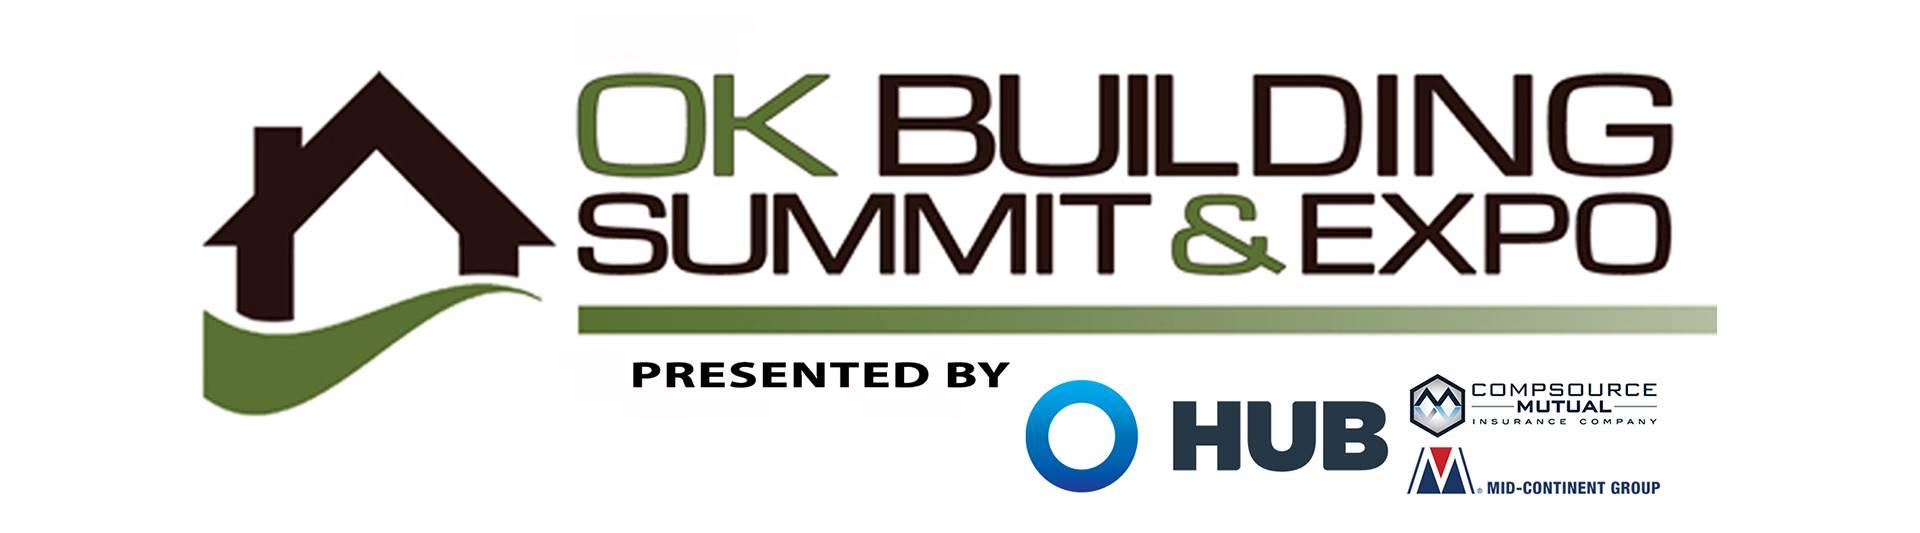 2020 OK Building Summit & Expo